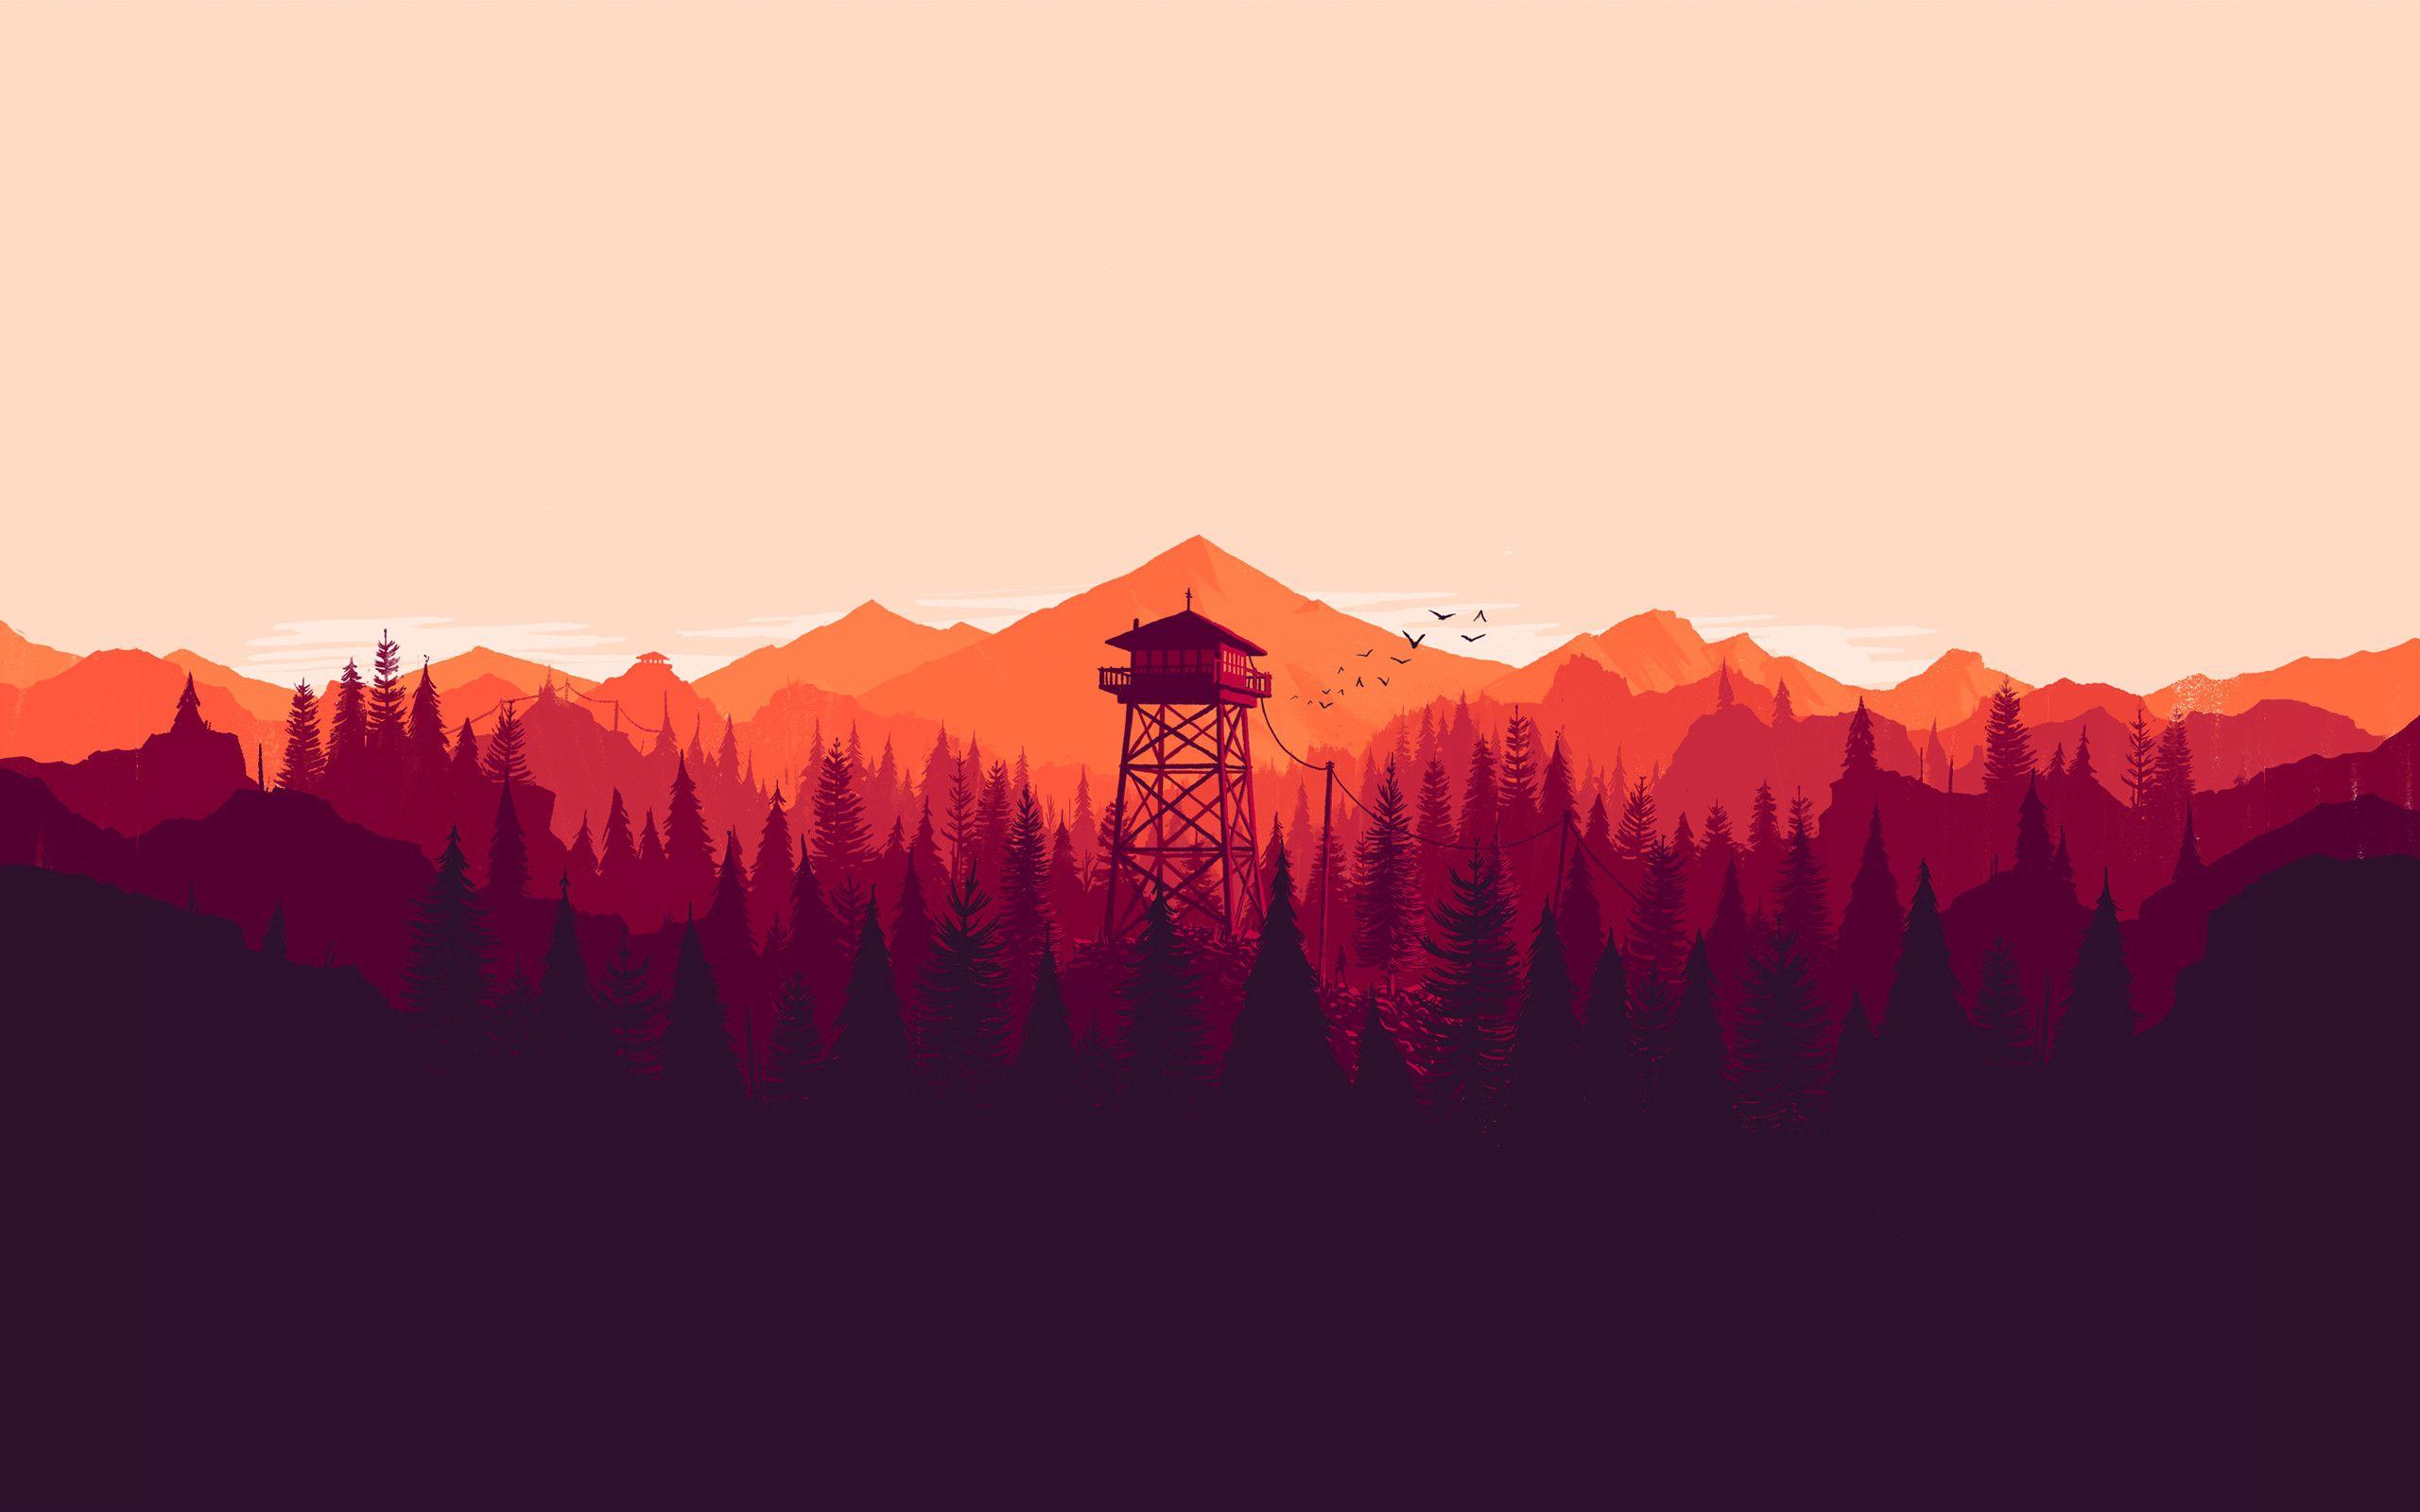 applife-wallpaper-minimalism38